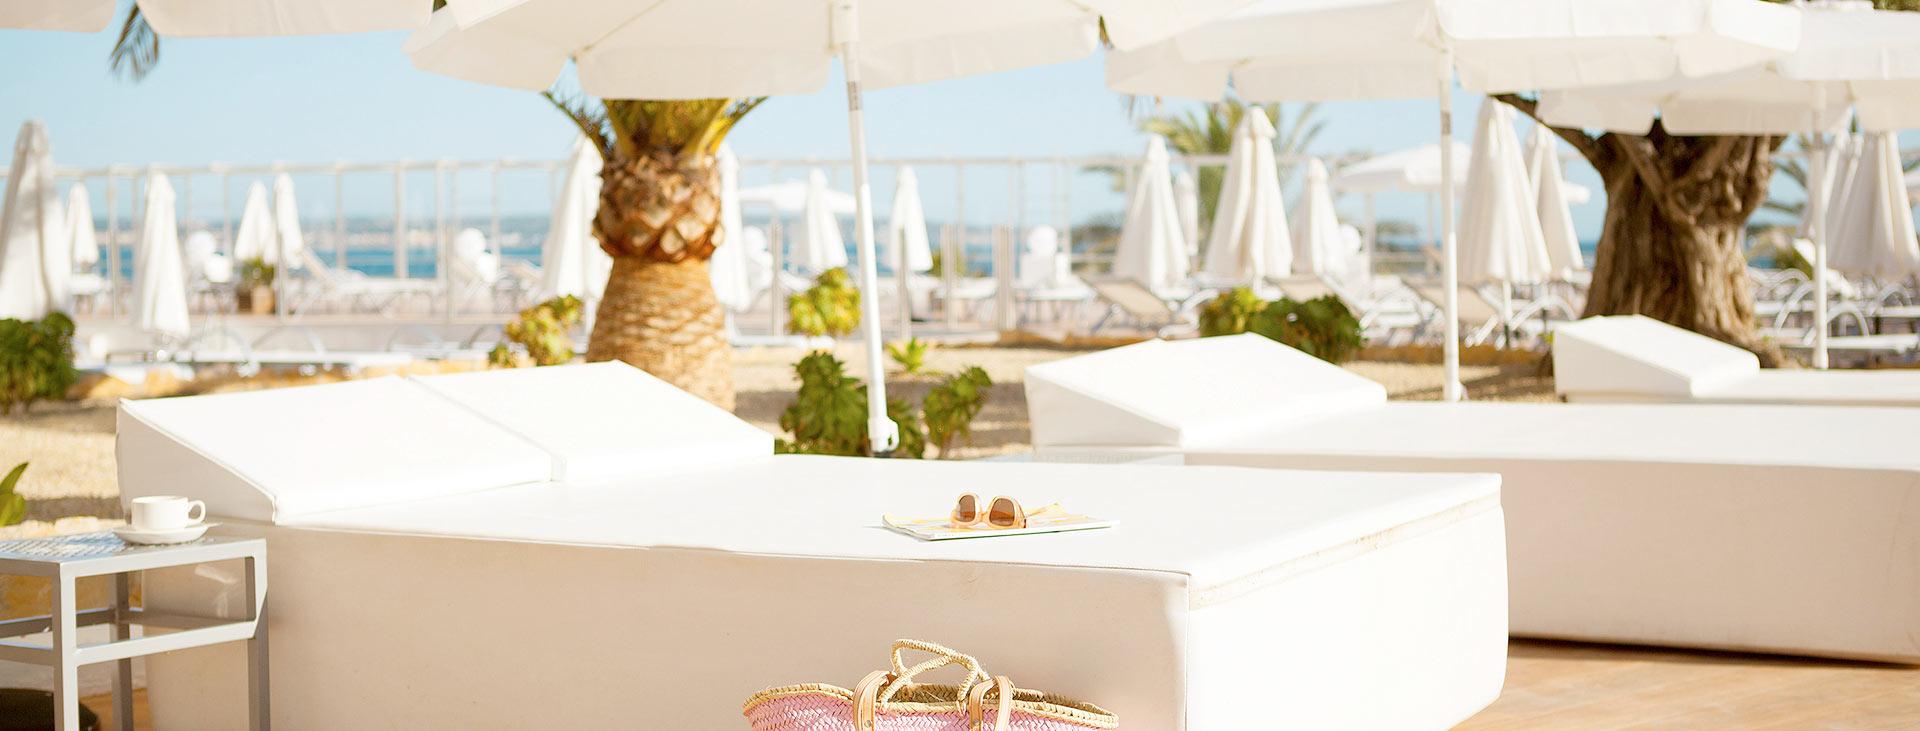 Sunprime Waterfront, Playa de Palma, Mallorca, Spania